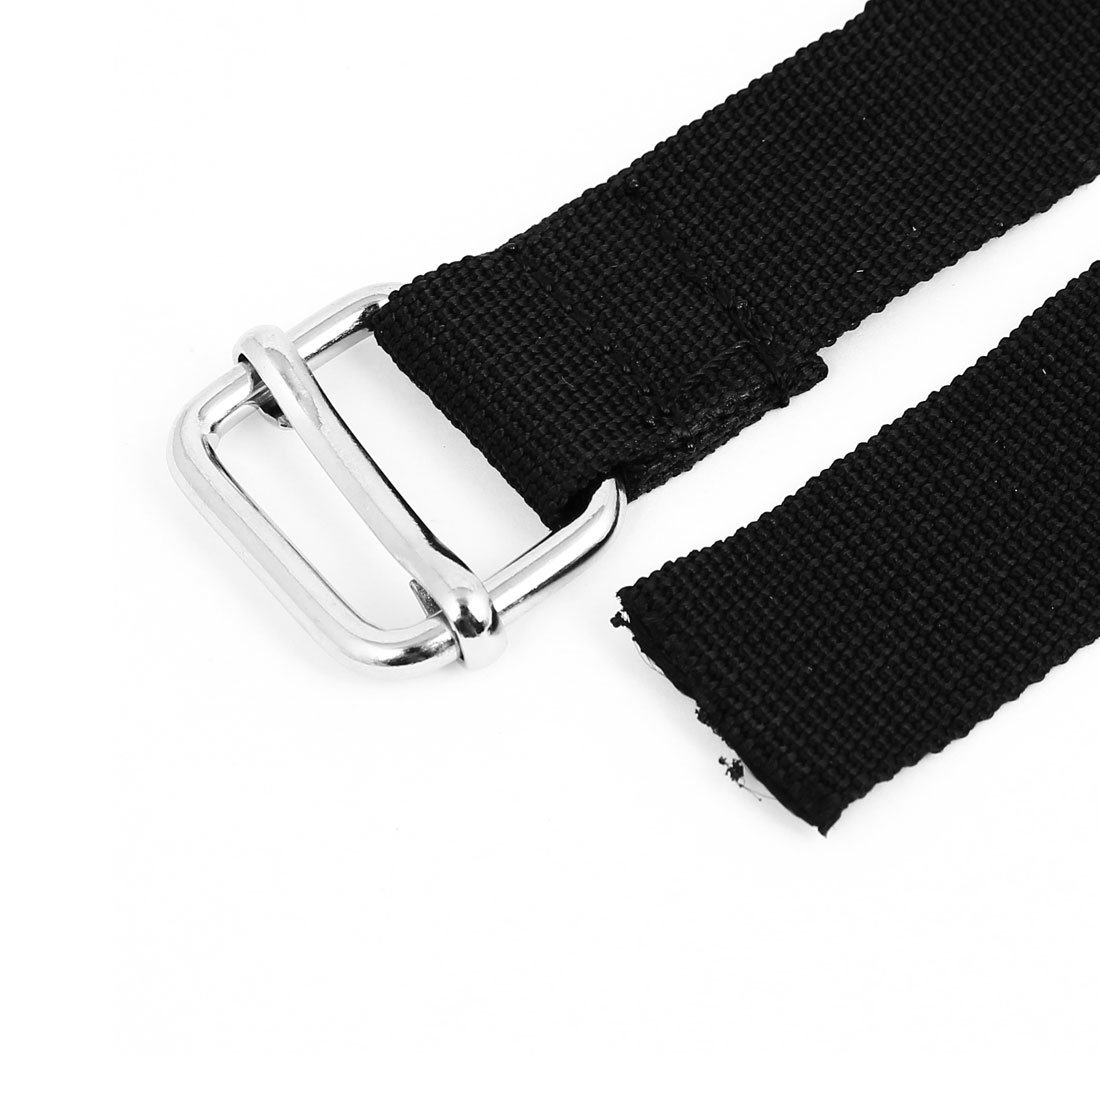 EbuyChX Metal Buckle Suitcase Bagahe Adjustable Belt Strap 2M x 25mm Black